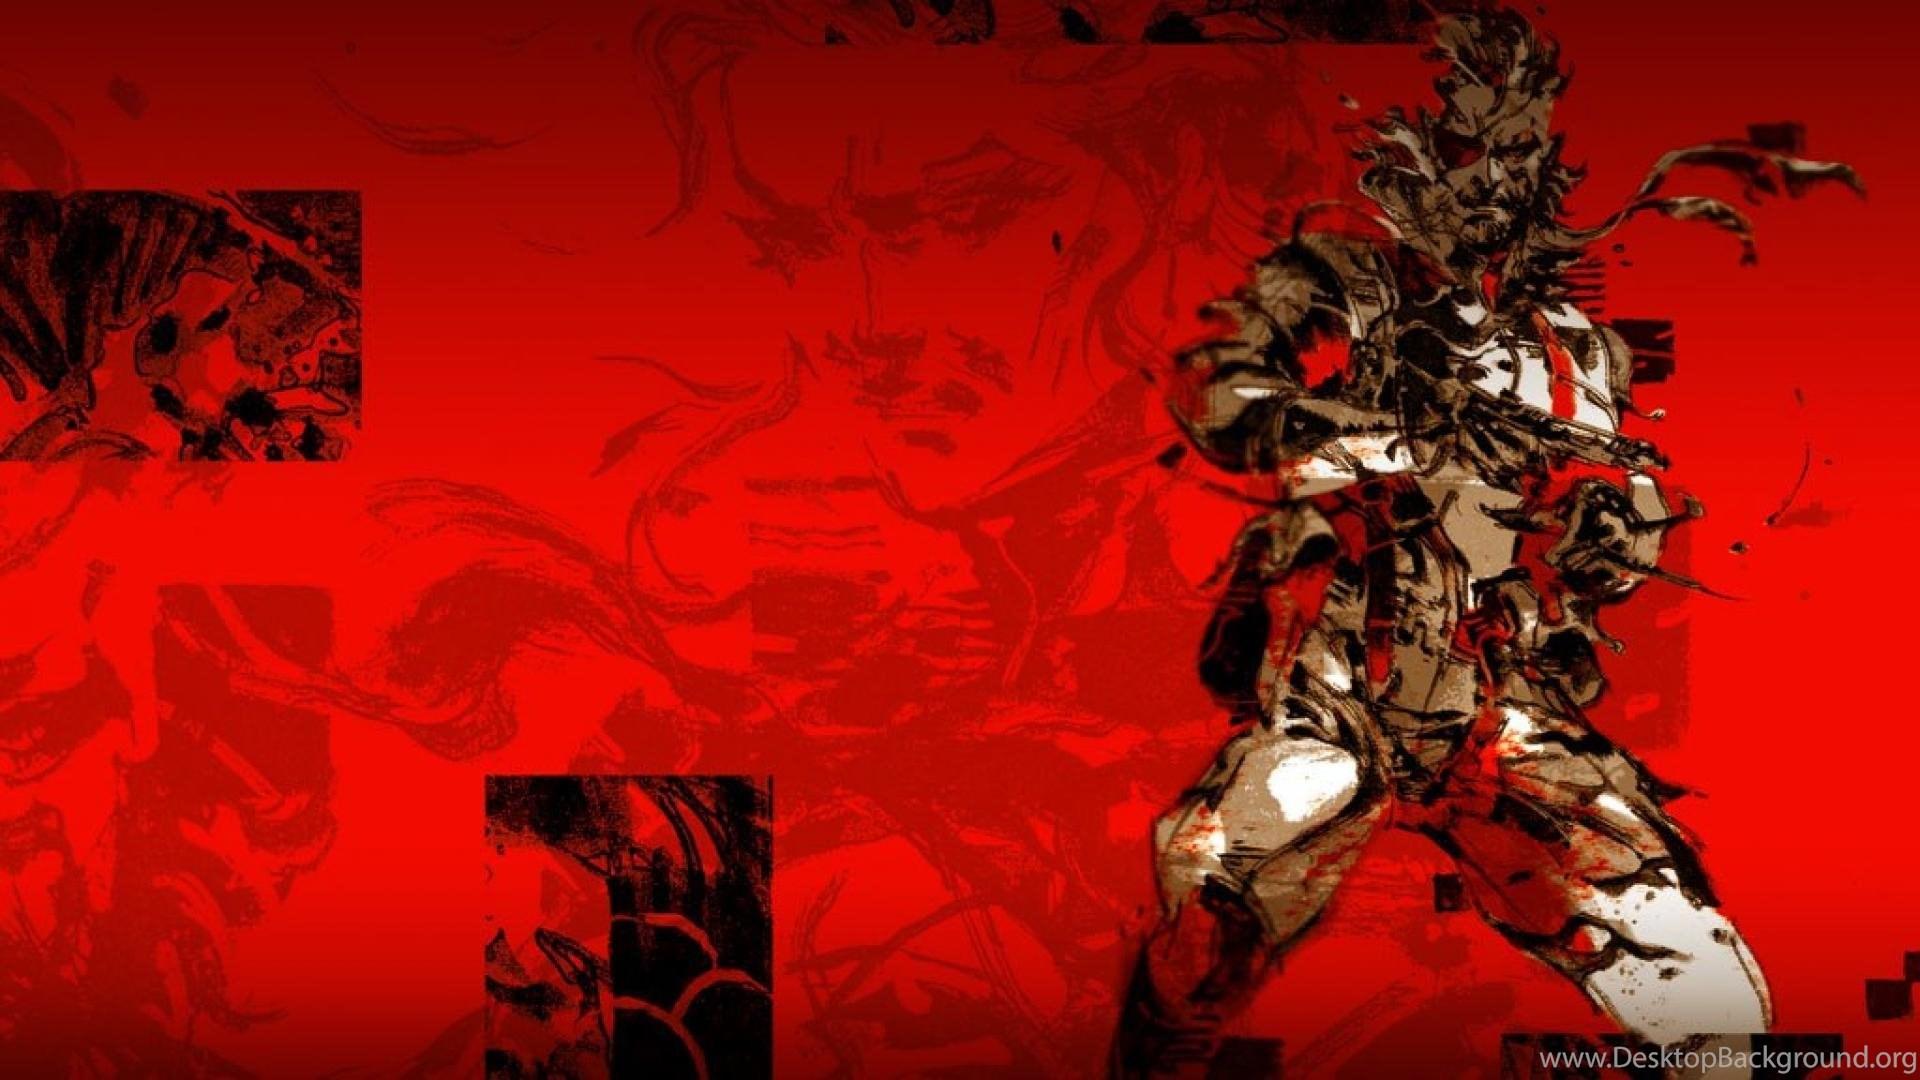 Metal Gear Solid Snake Eater Art Hd Wallpapers Desktop Background